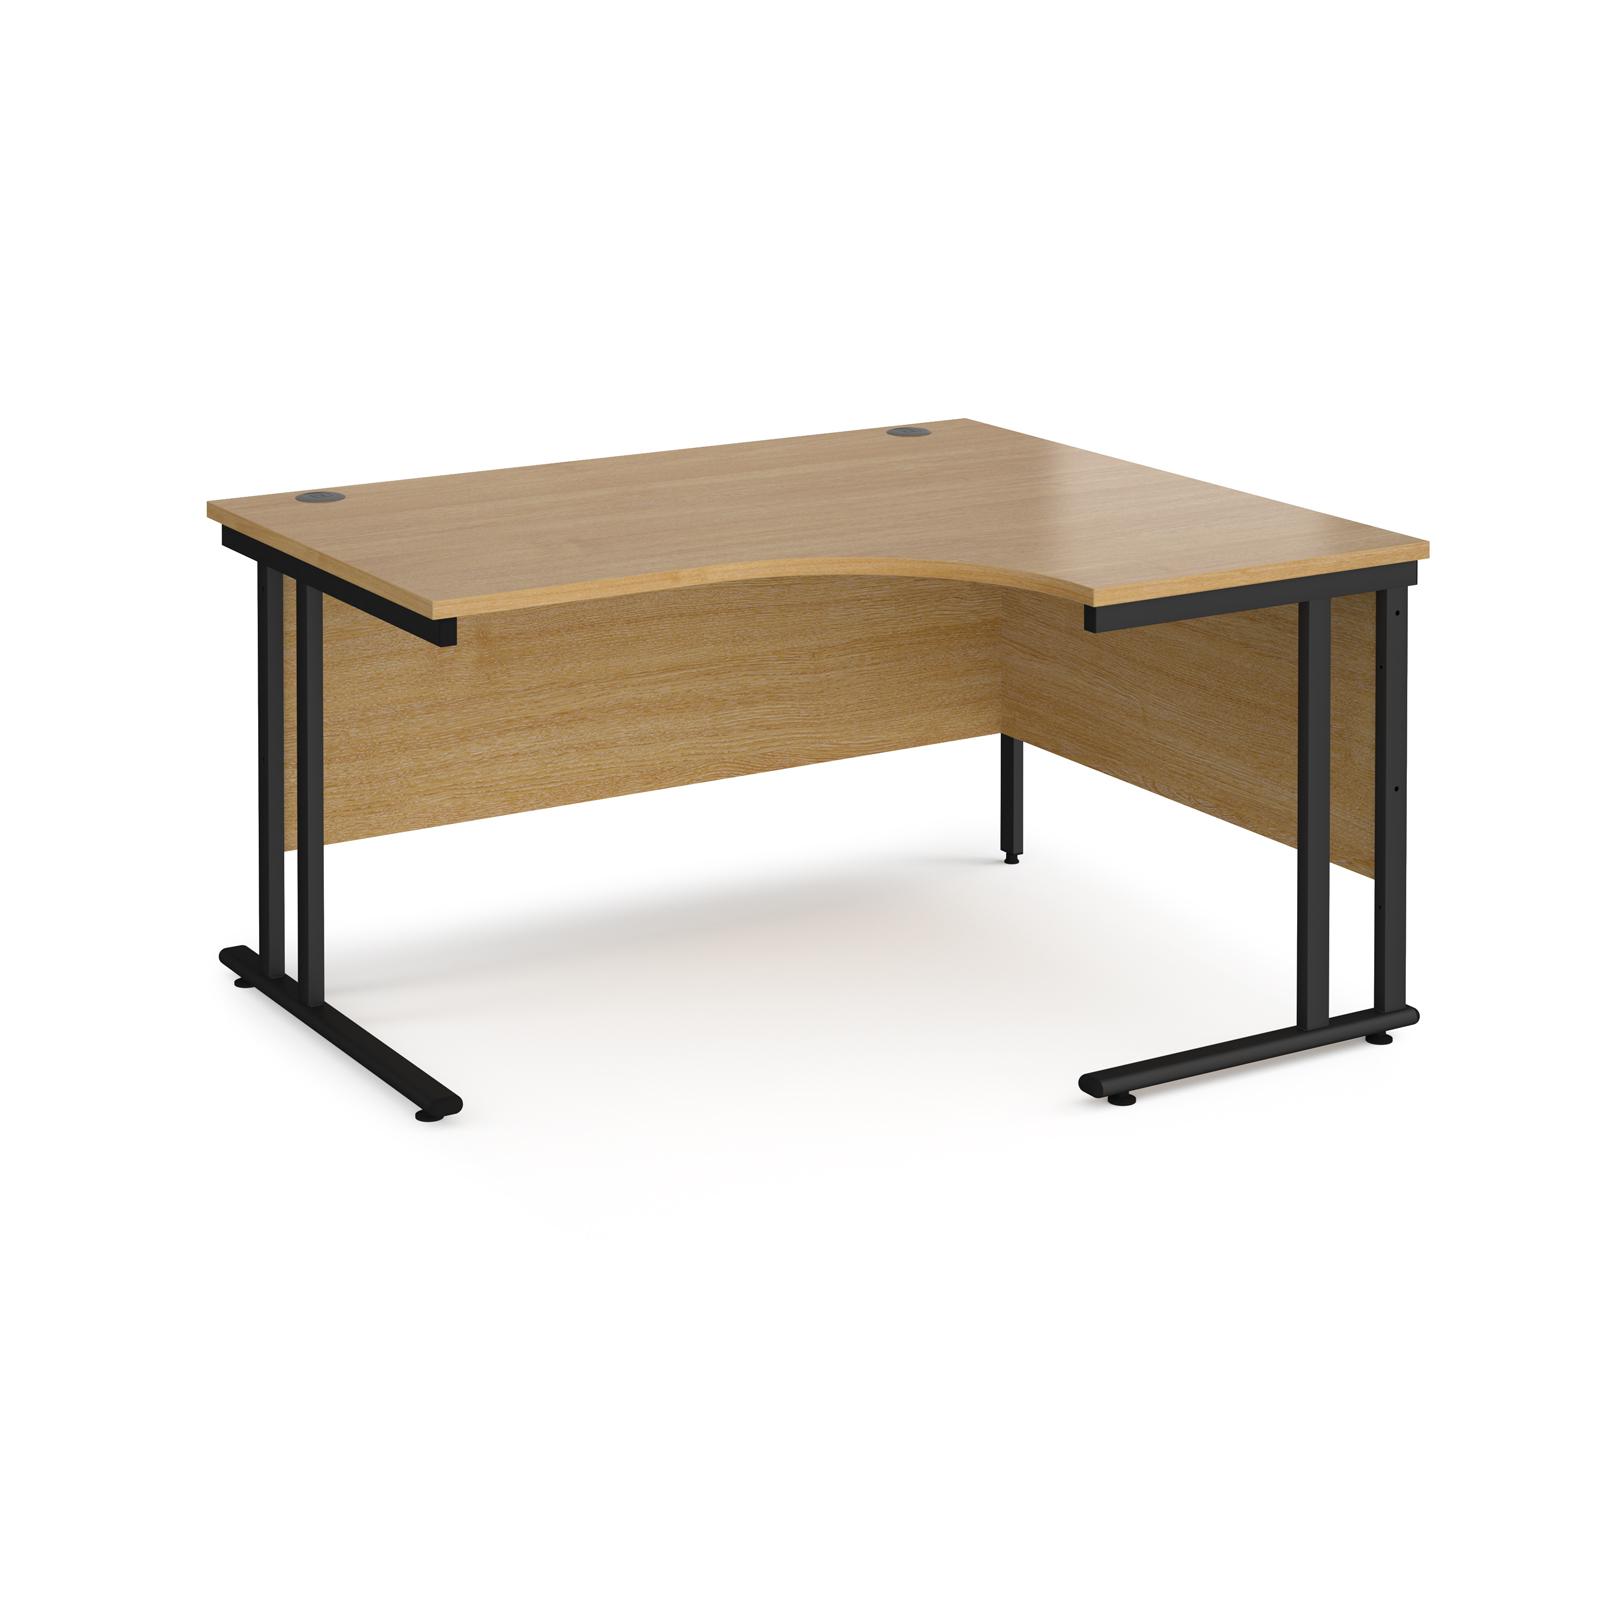 Right Handed Maestro 25 right hand ergonomic desk 1400mm wide - black cantilever leg frame, oak top